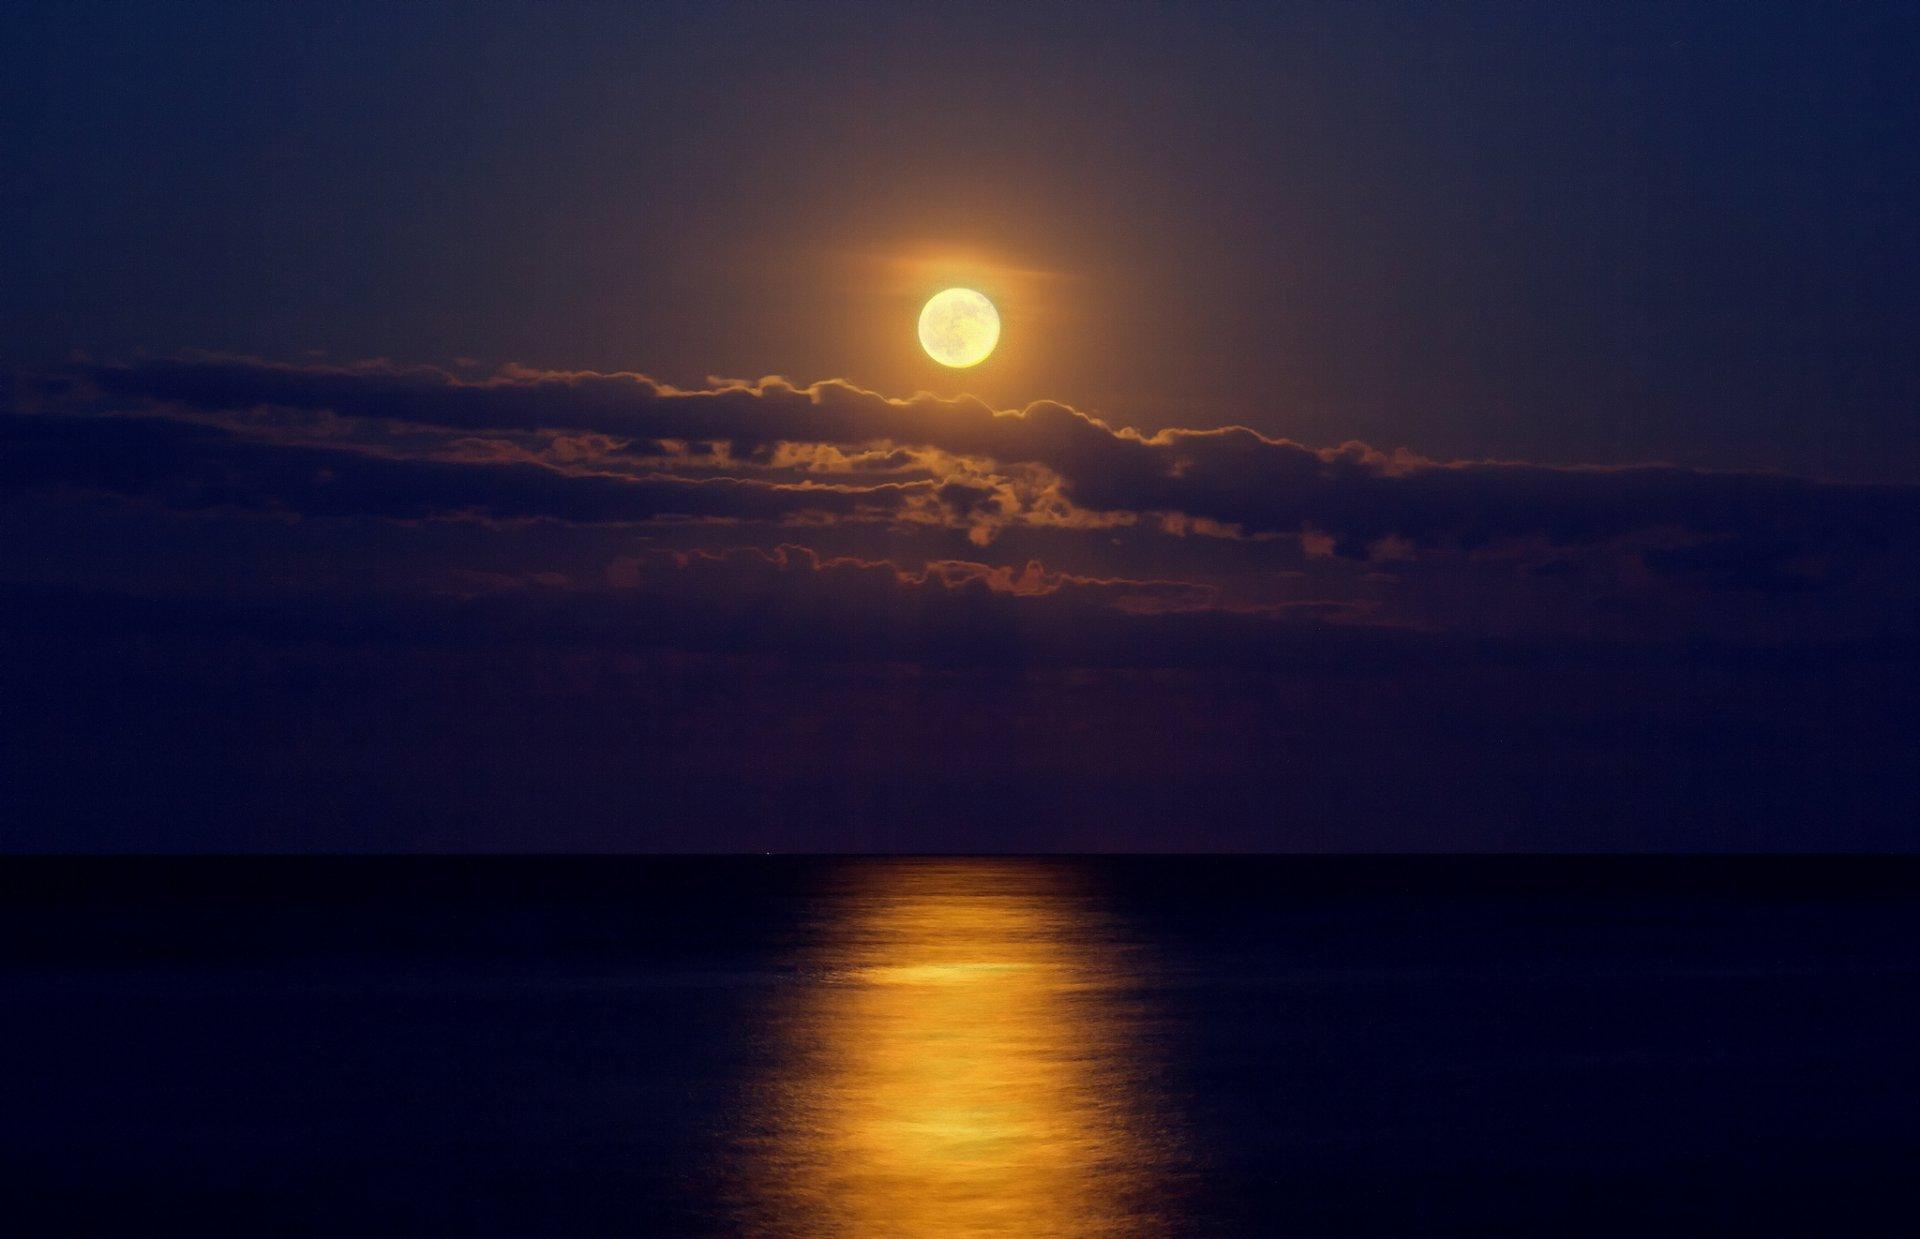 ночь луна море night the moon sea скачать